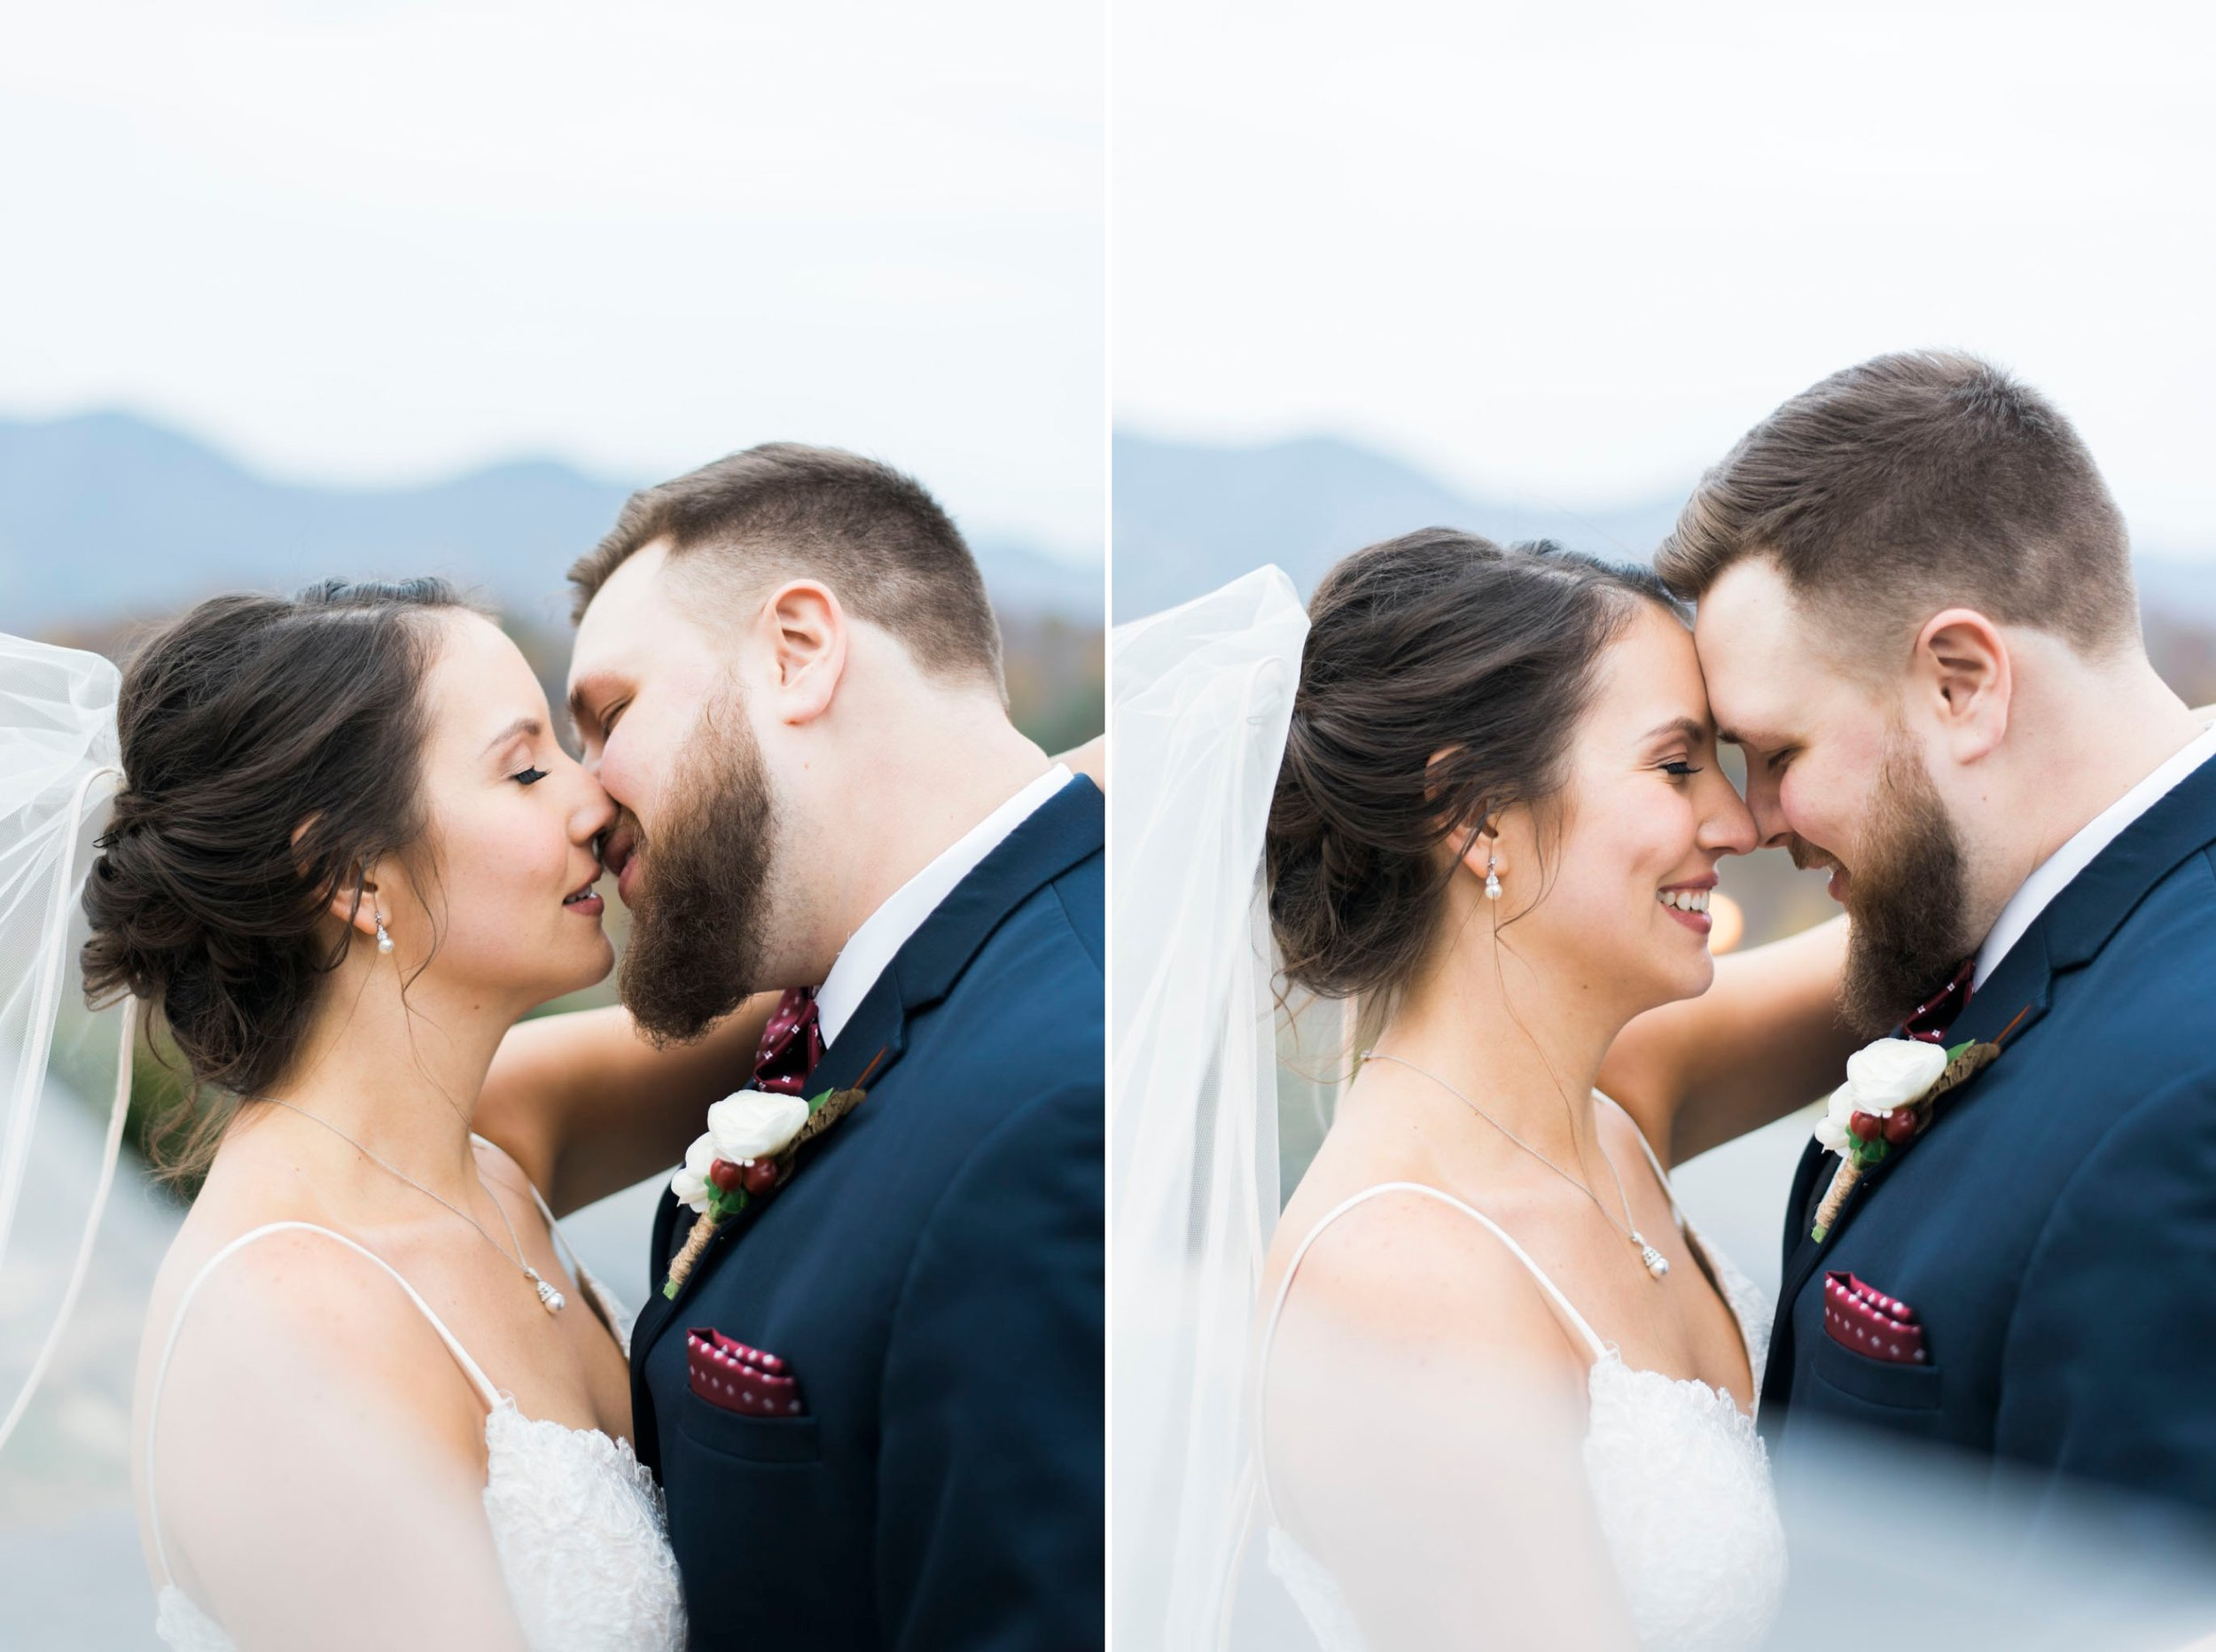 IrvineEstate_LexingtonVA_Wedding_FallWedding_VirginiaWeddingPhotographer 96.jpg